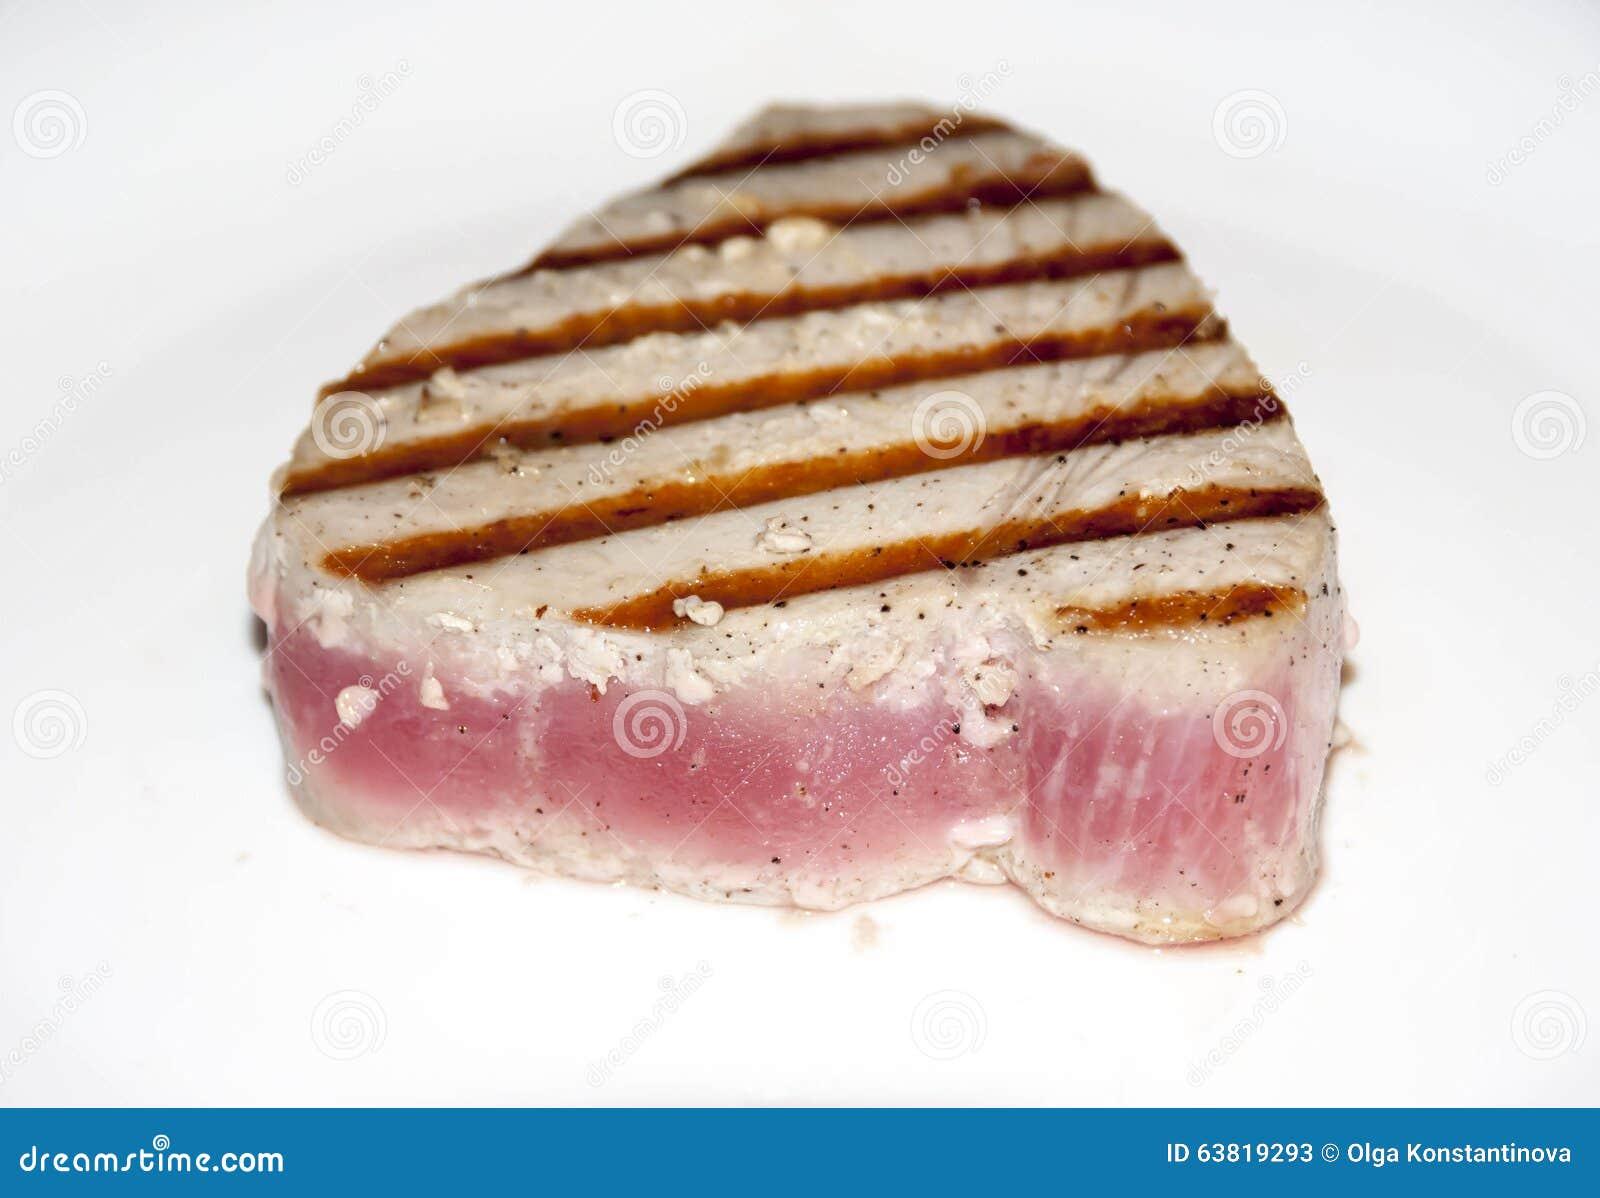 how to cook tuna fish